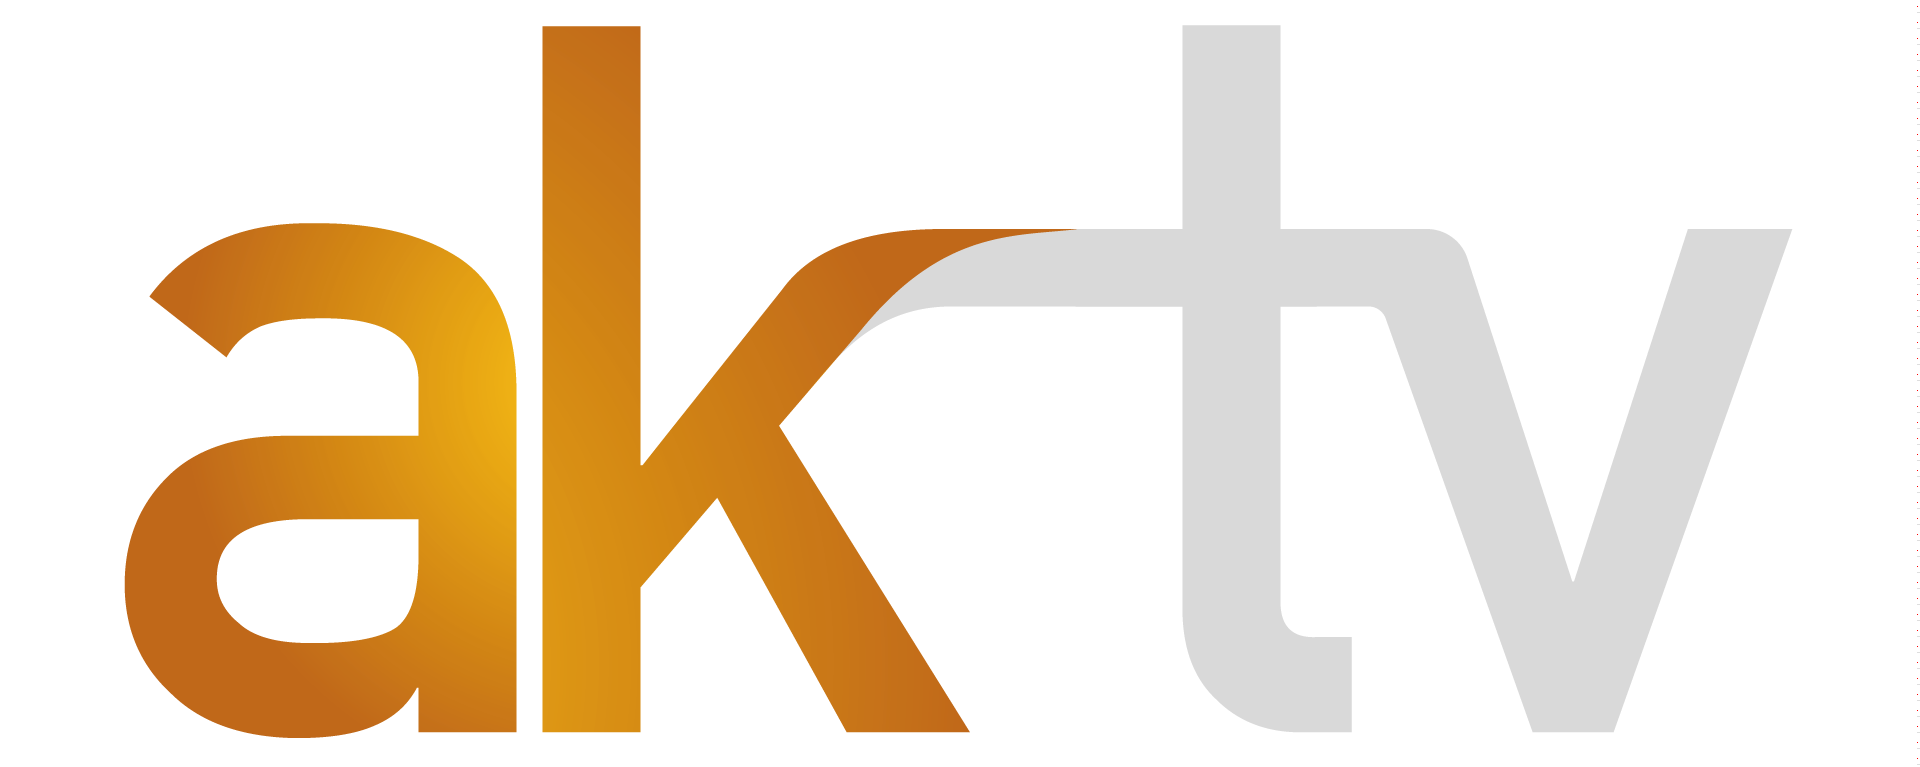 AKTV - Akademska televizija